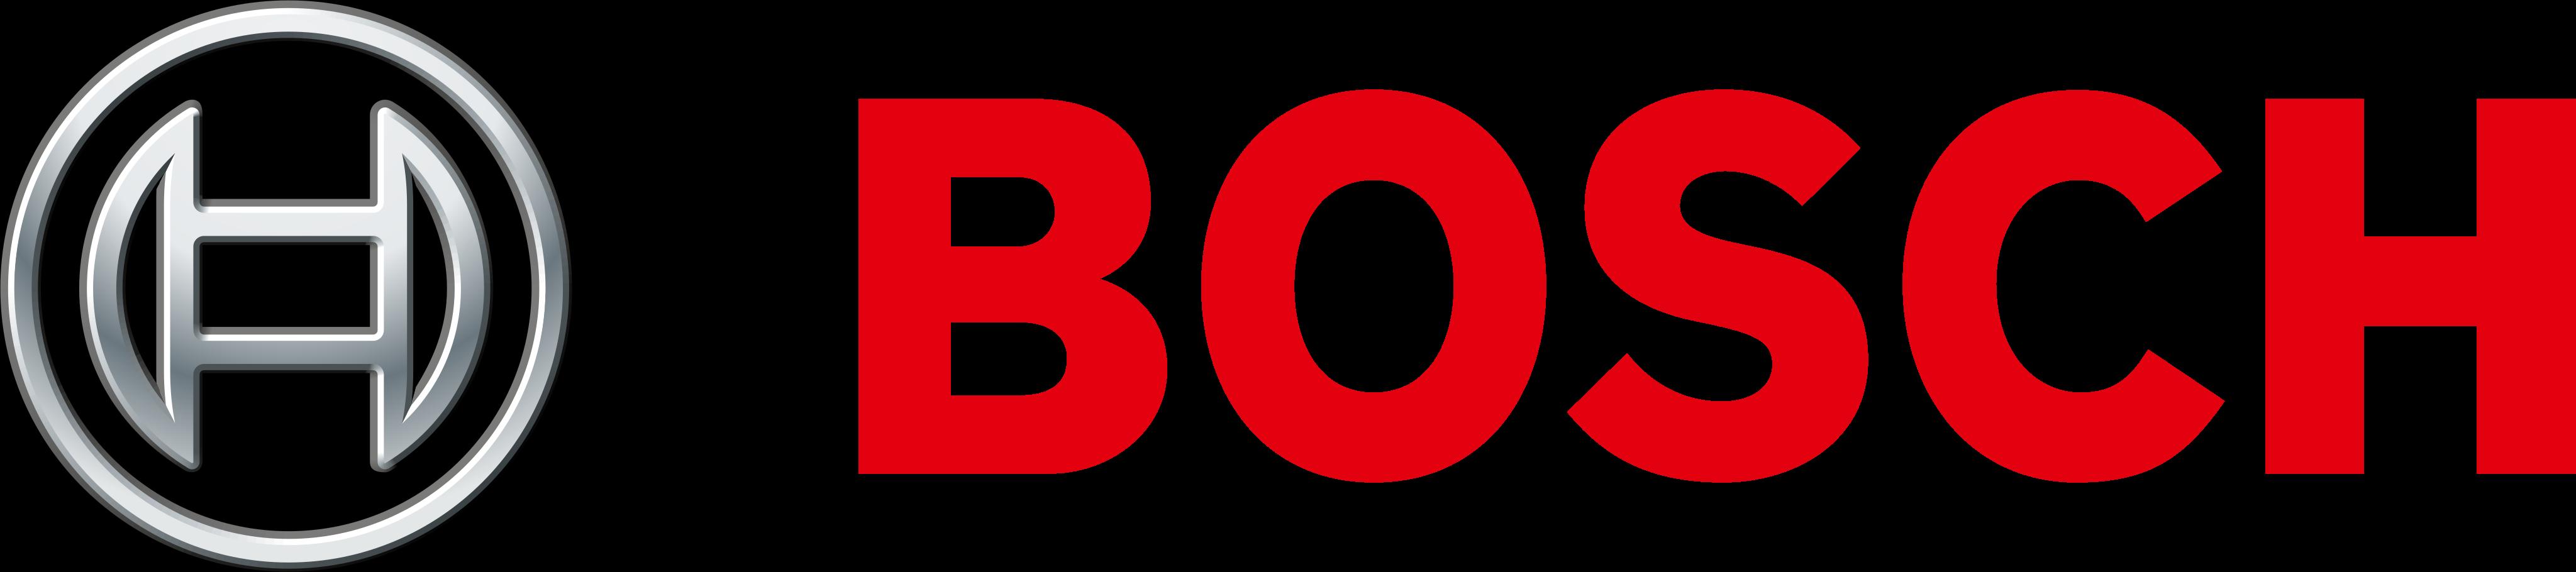 bosch logo - Bosch Logo